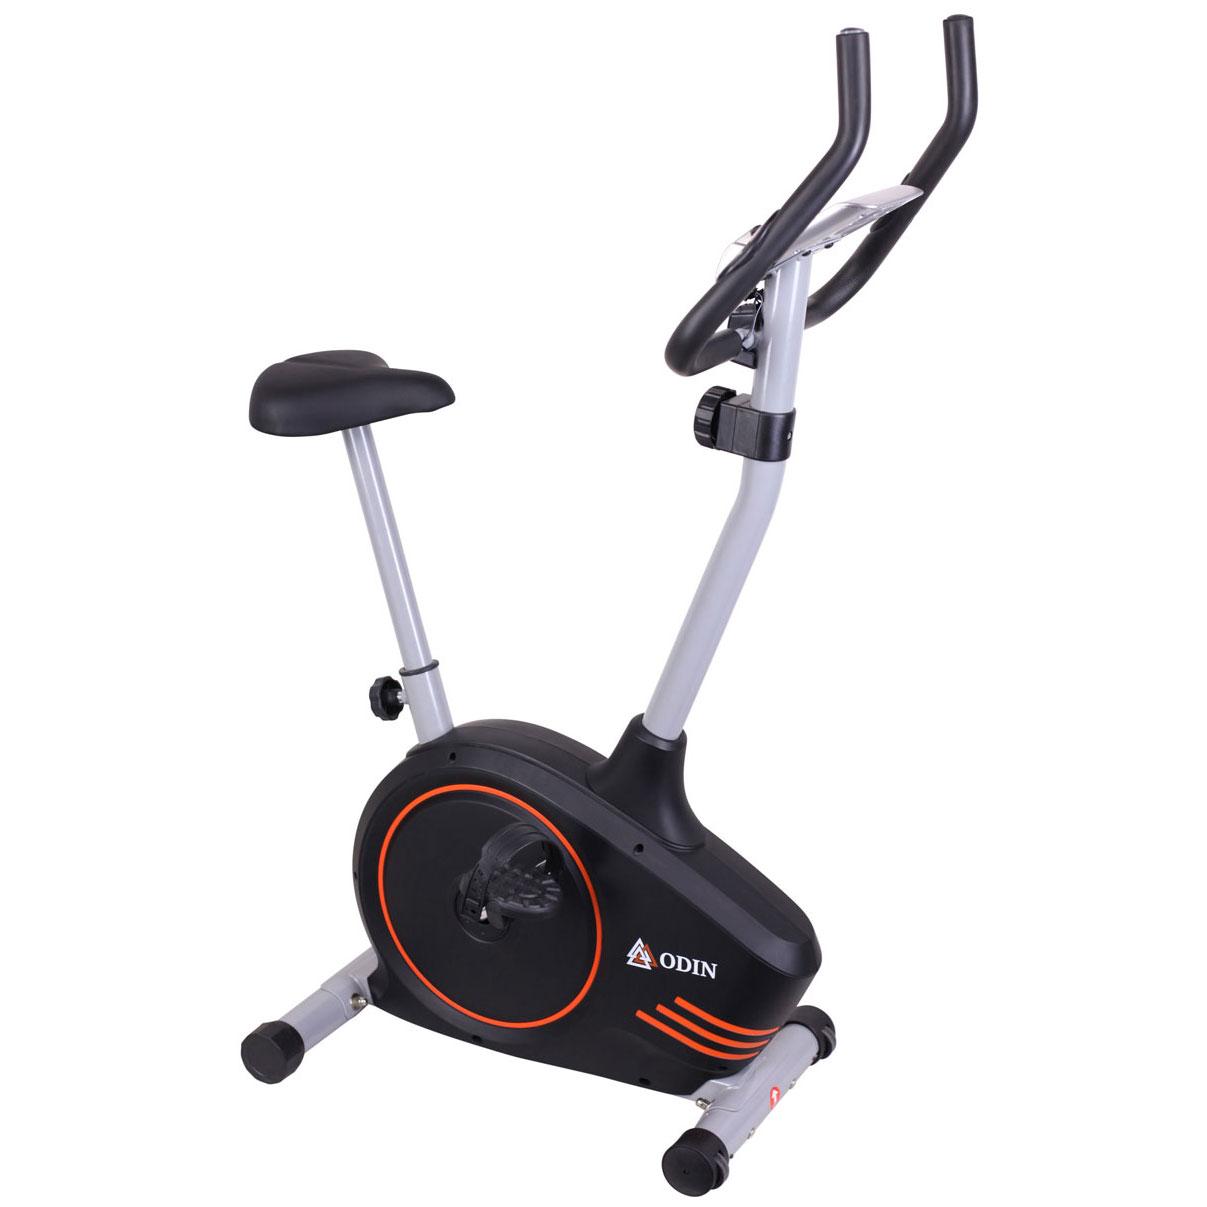 Odin B300 Motionscykel